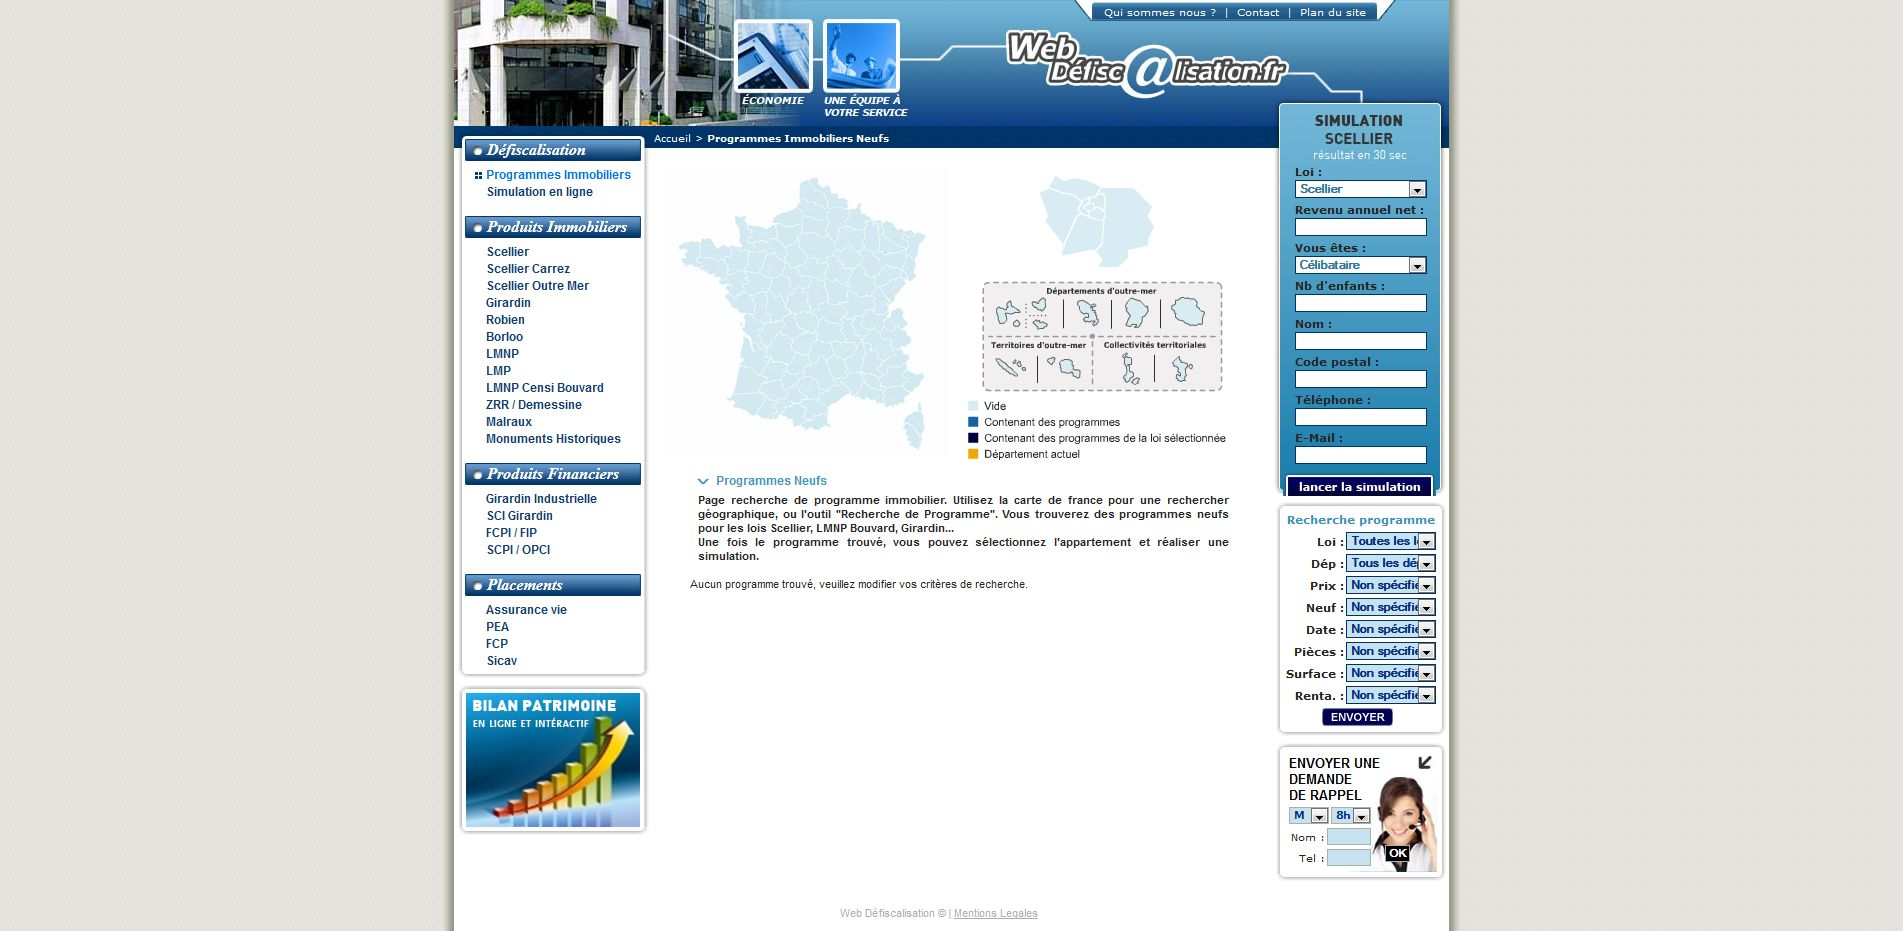 Web defiscalisation - programmes